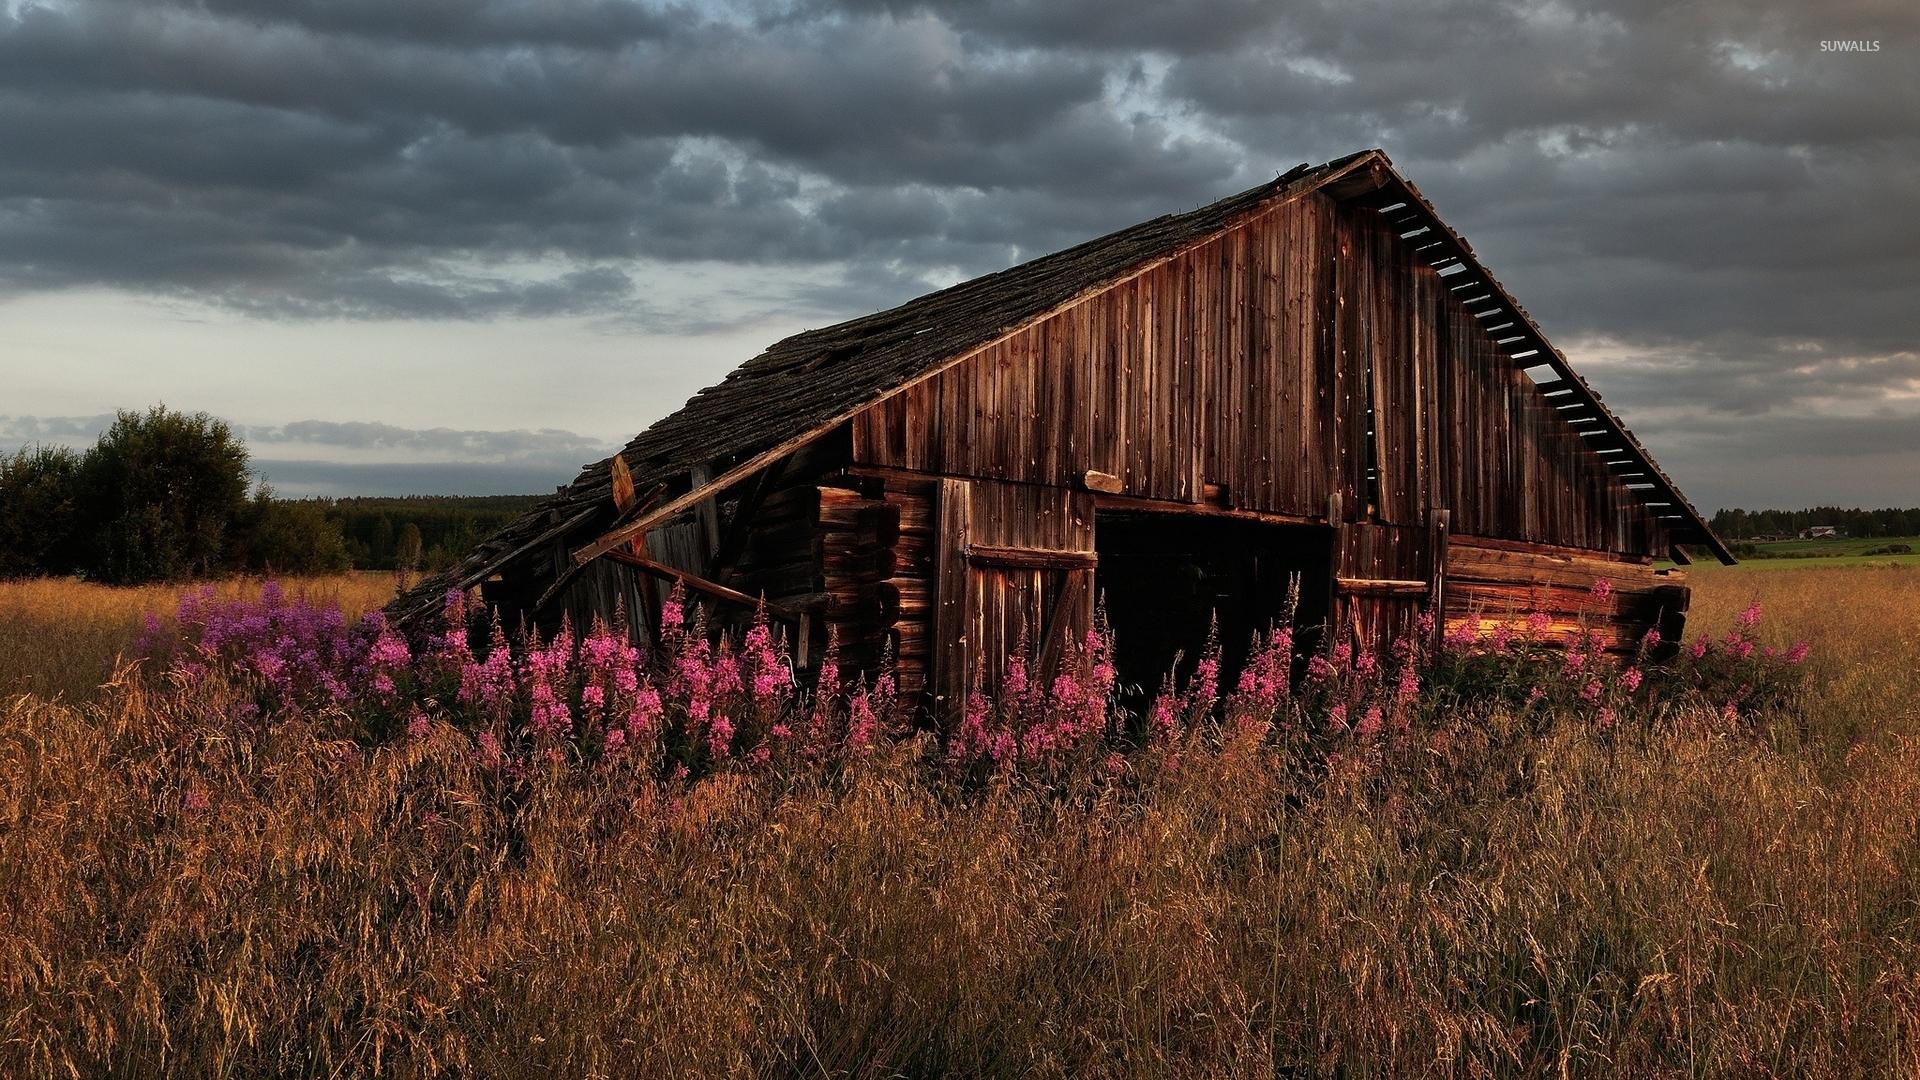 barn wallpaper - photo #18